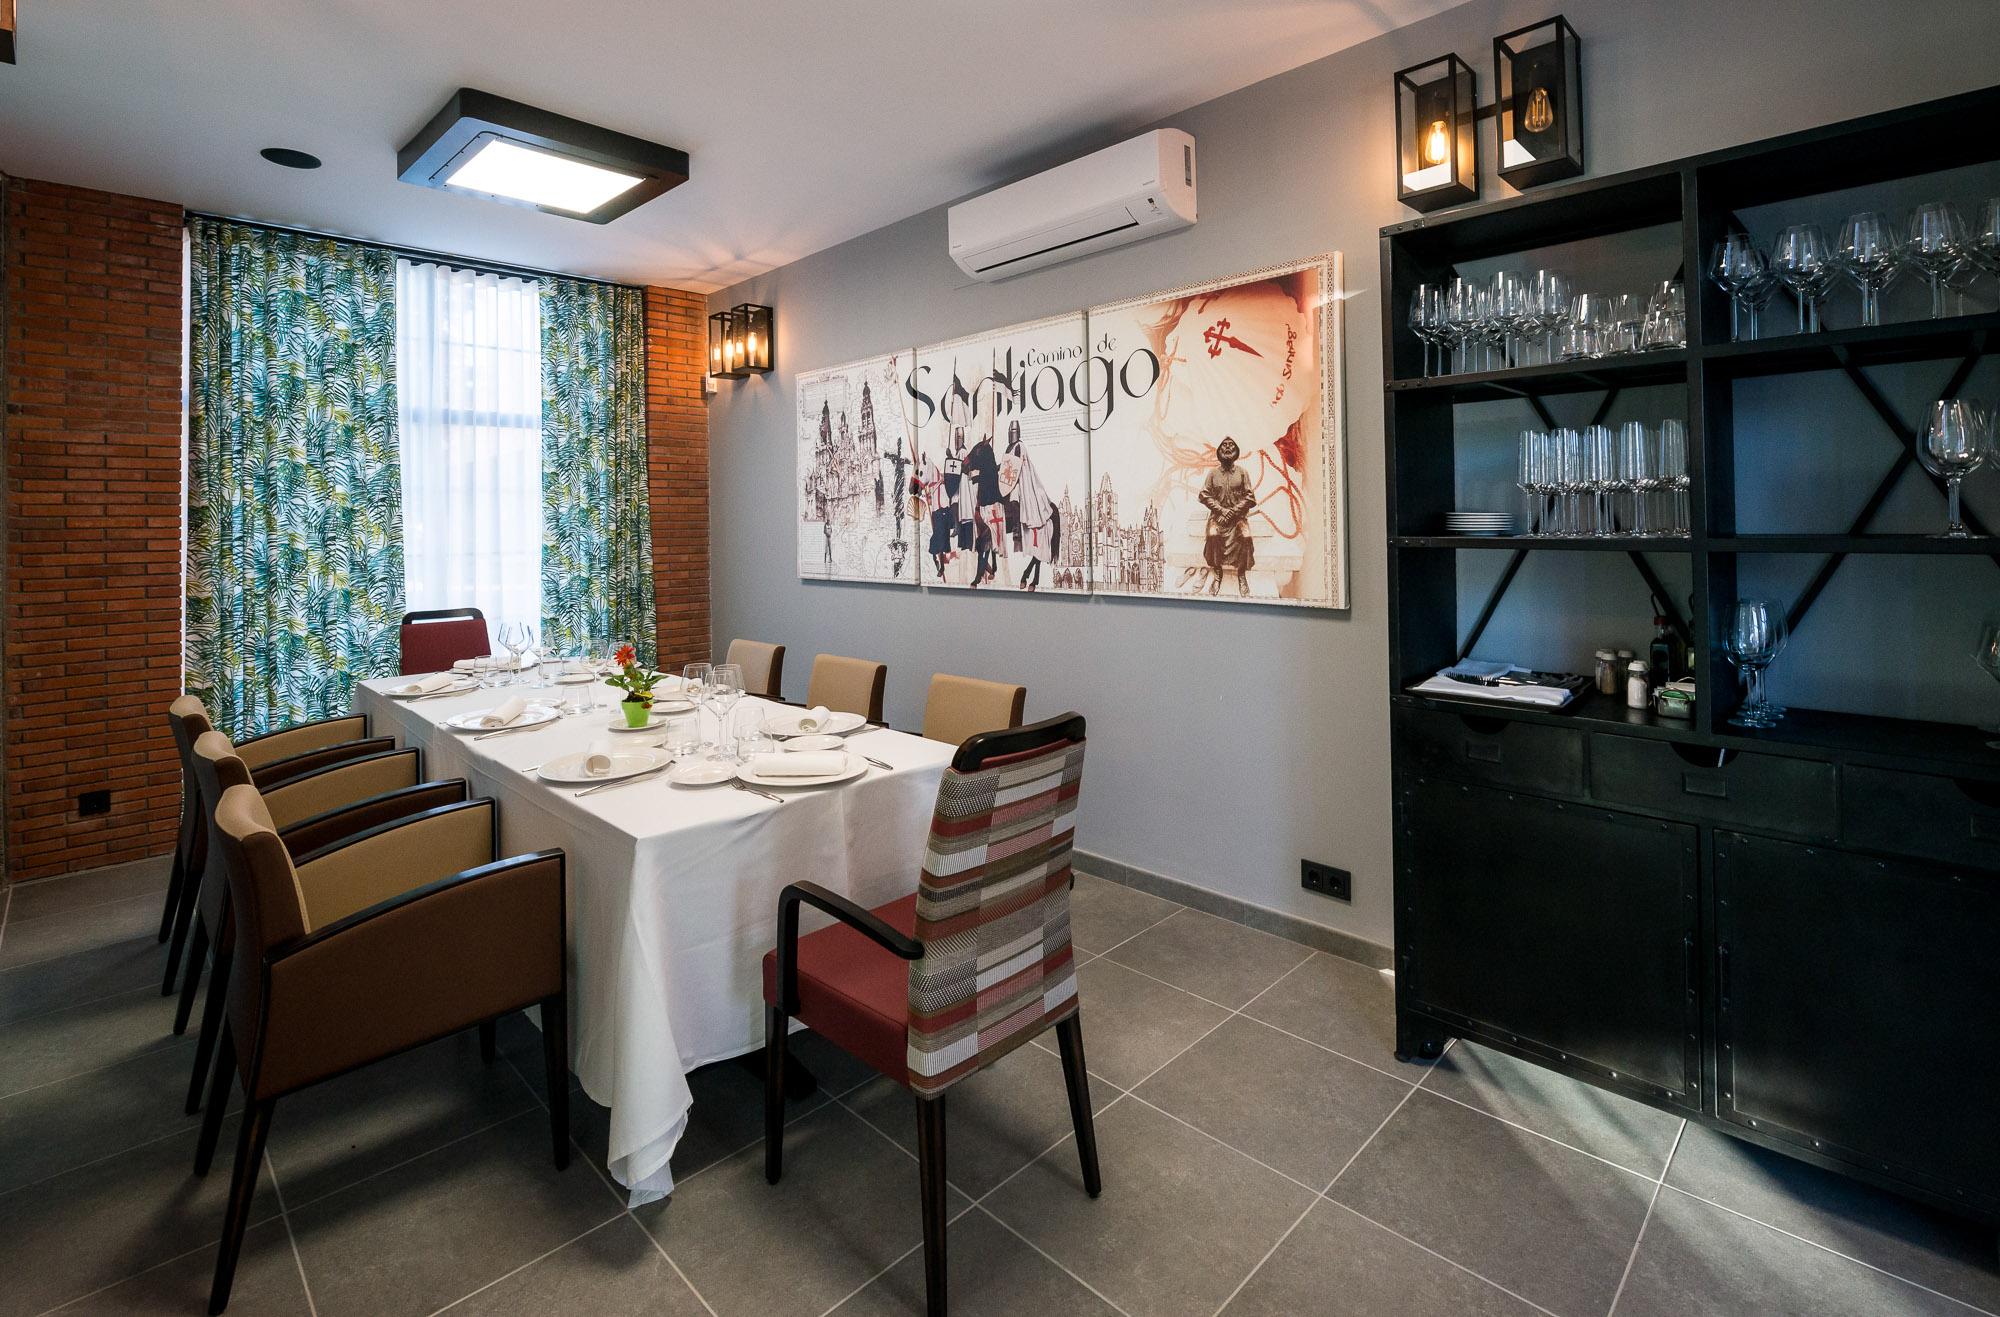 Restaurante Paso Honroso - Privado